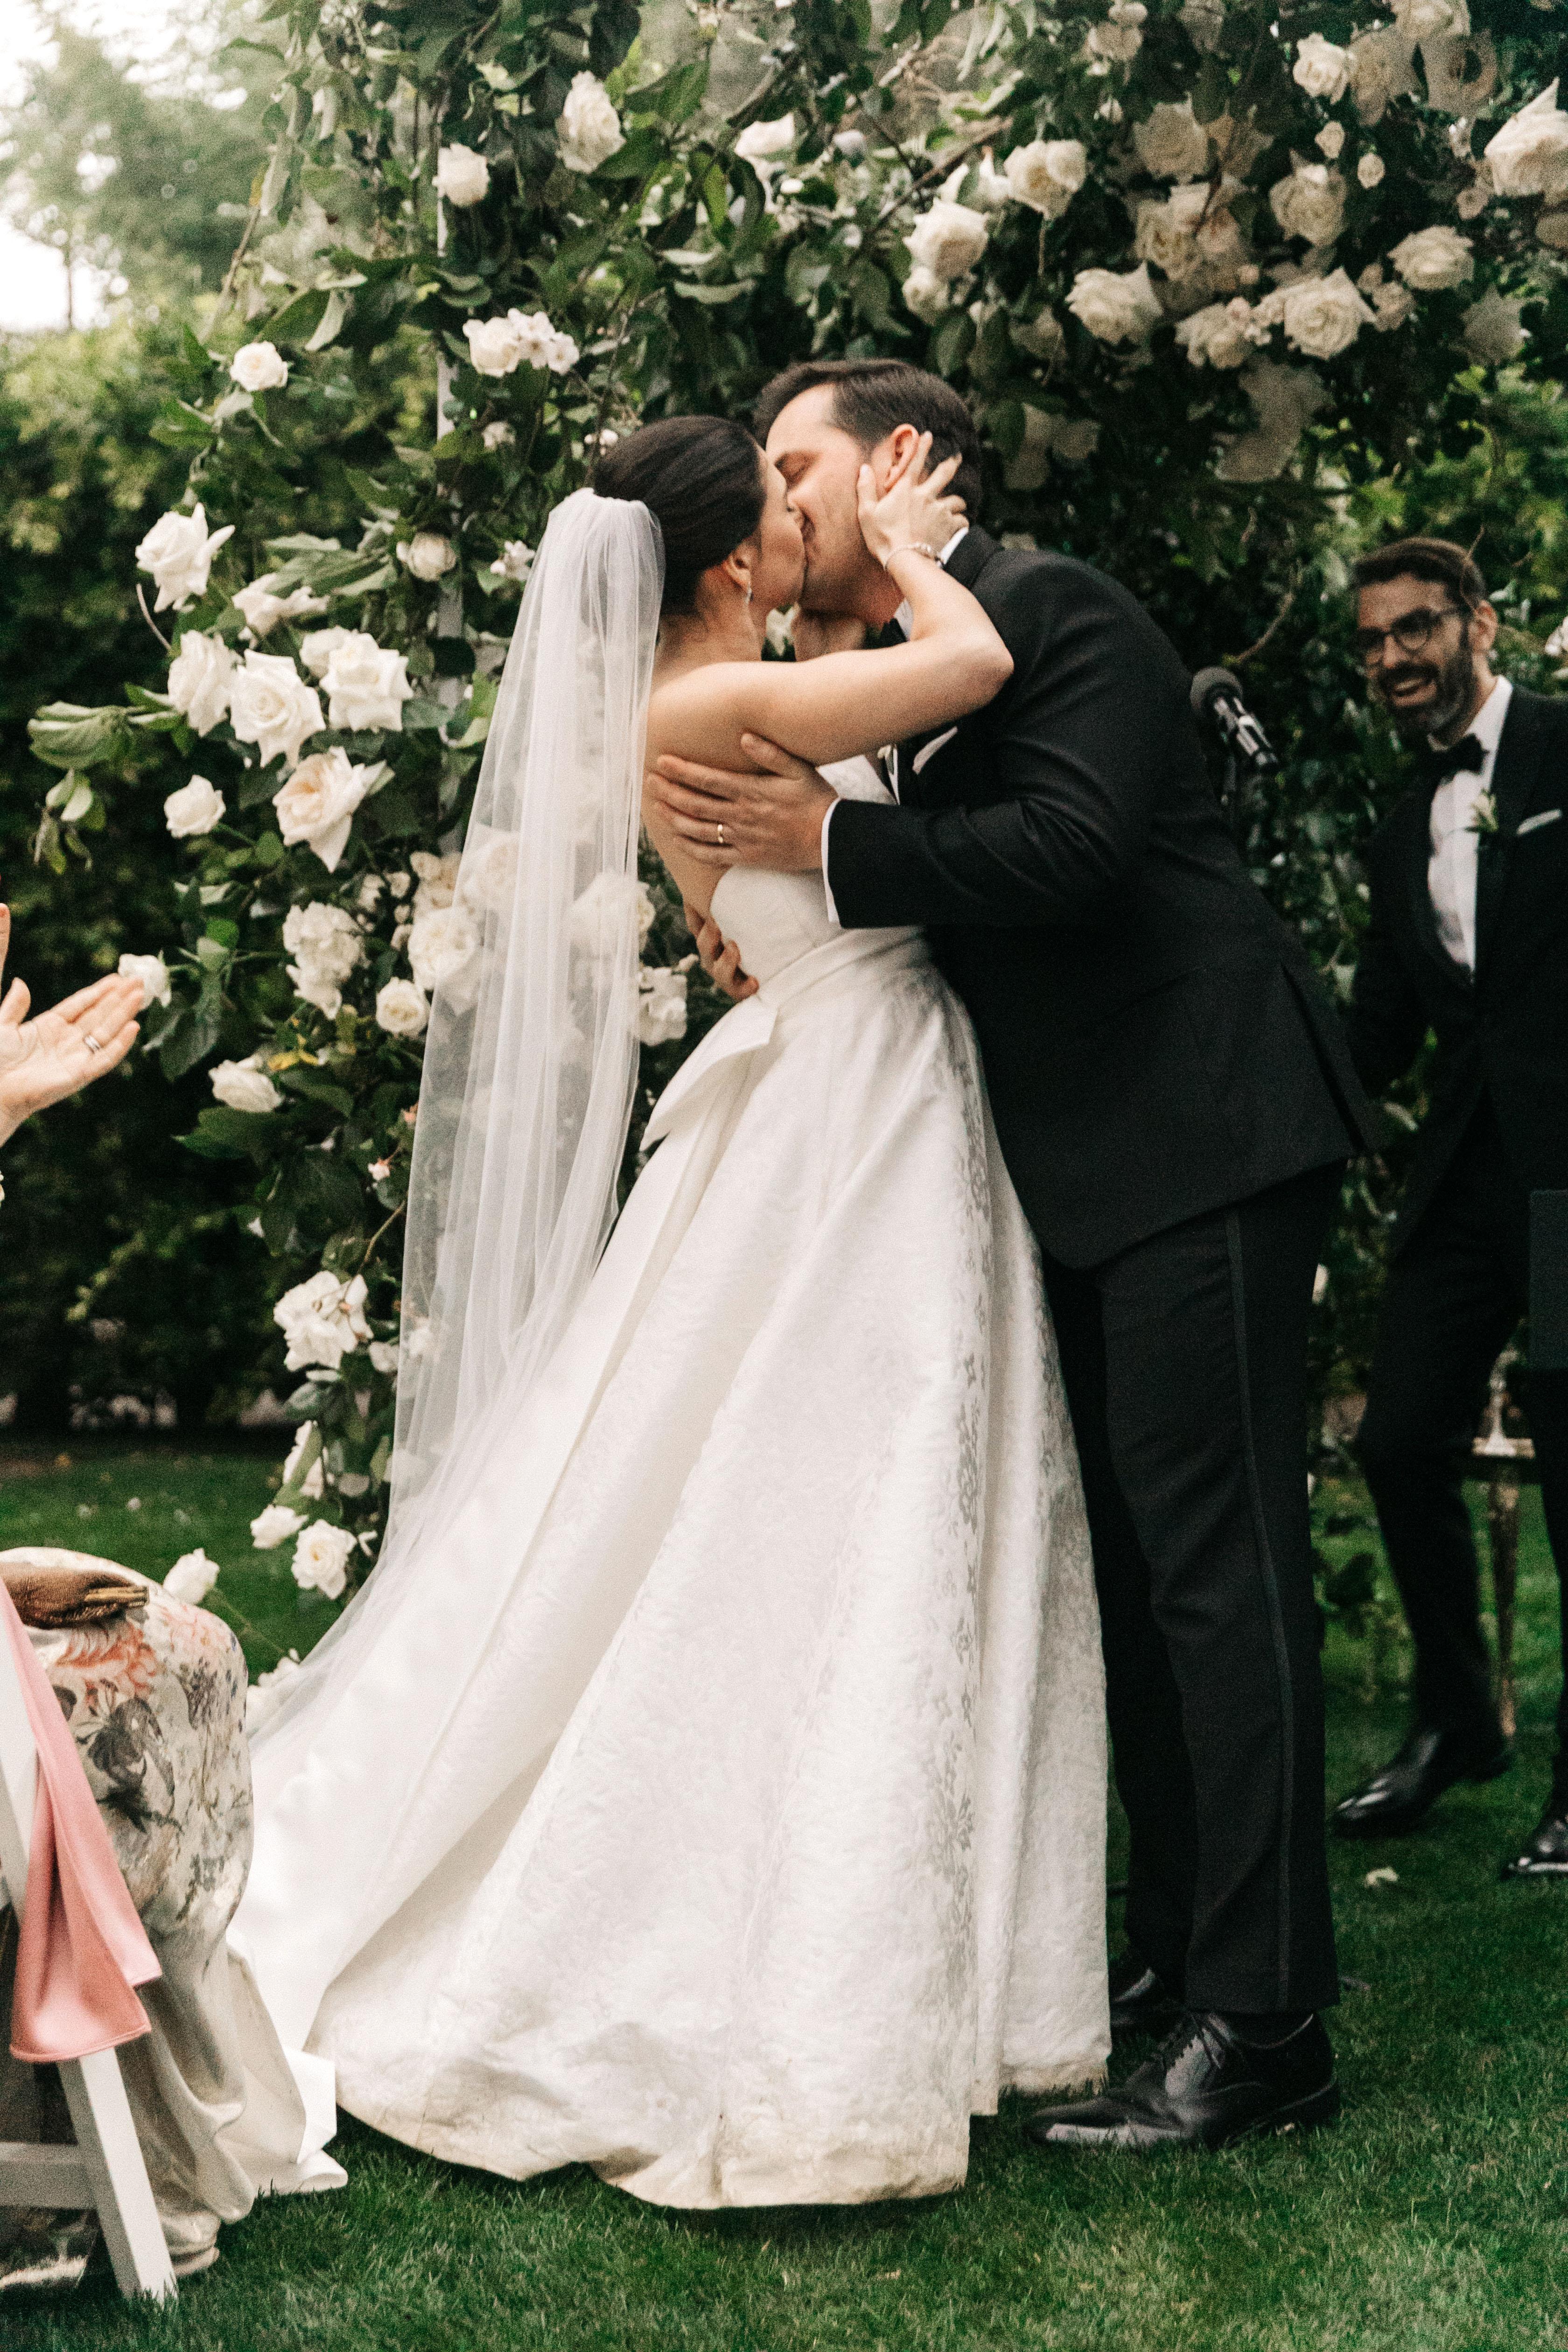 mia patrick wedding ceremony bride and groom kiss